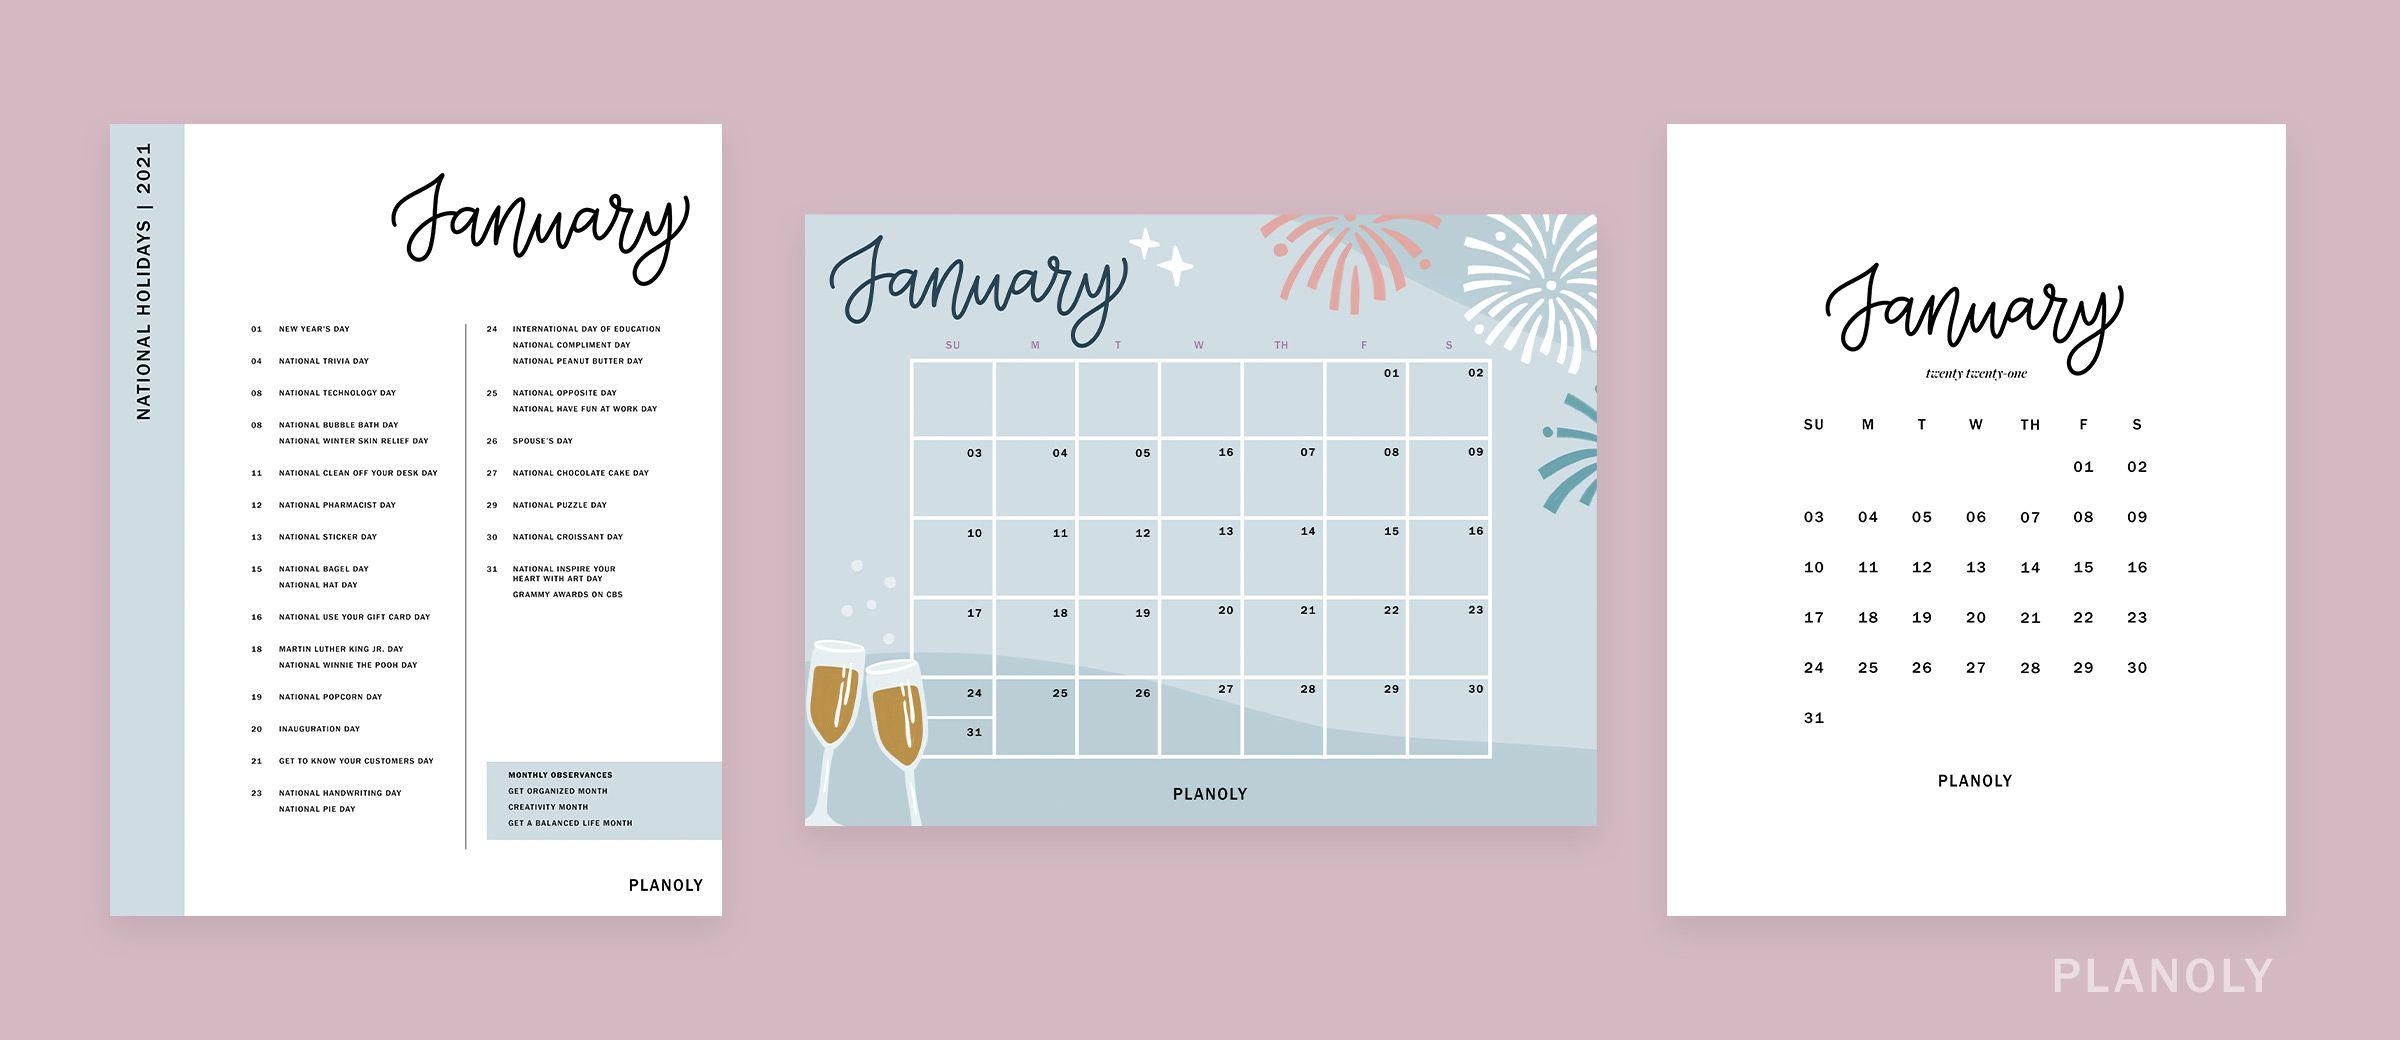 PLANOLY-Blog Post-Q1 Content Calendars-Image 1